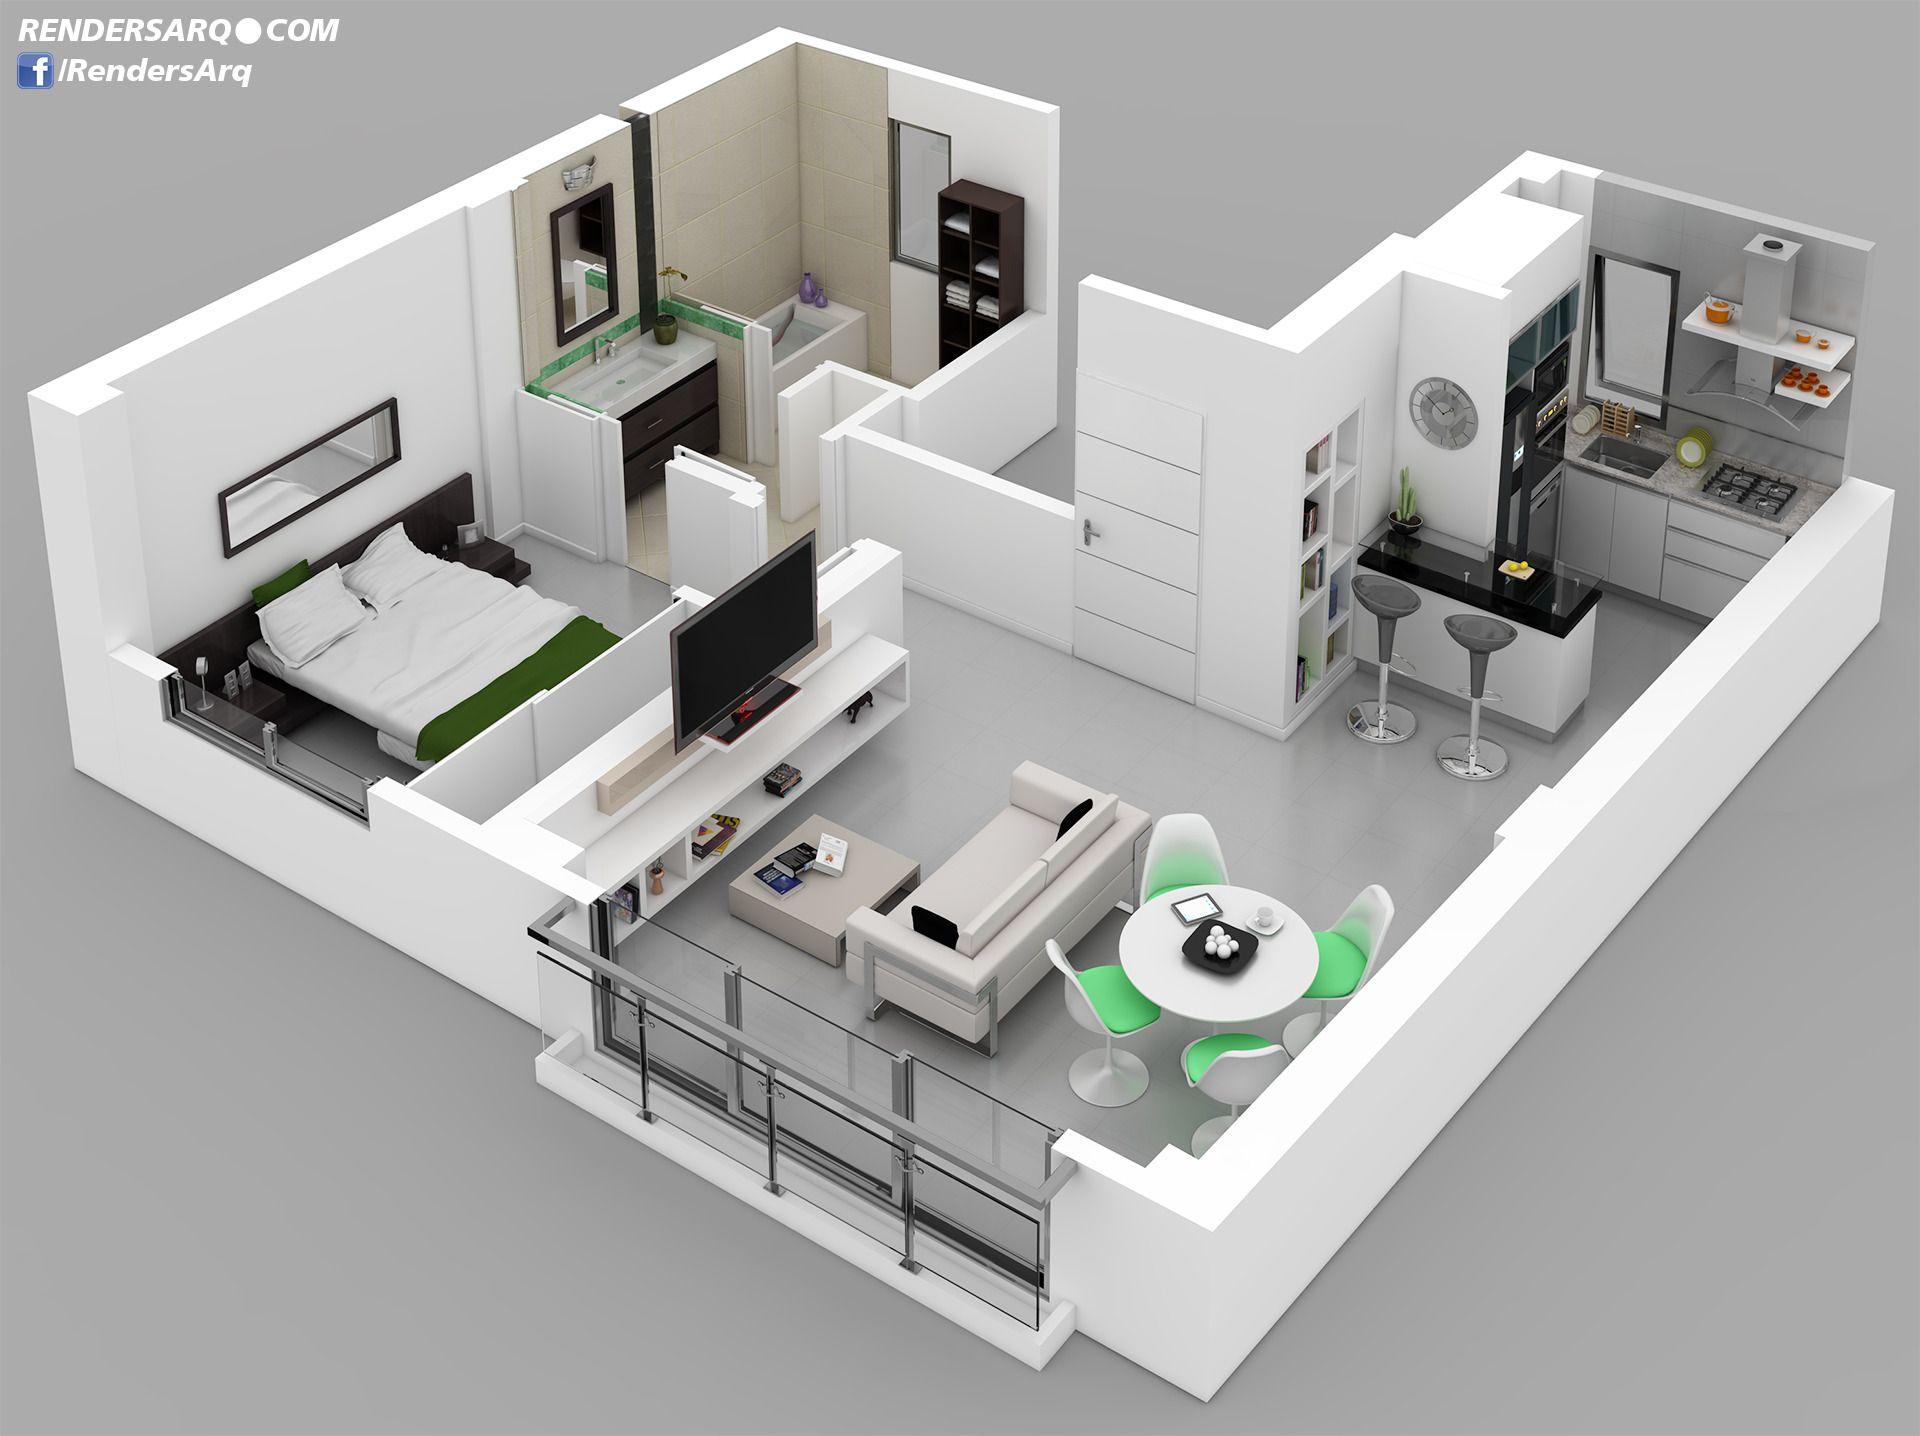 Renders Casas En 3d Planos De Casas 3d Diseno Casas Pequenas